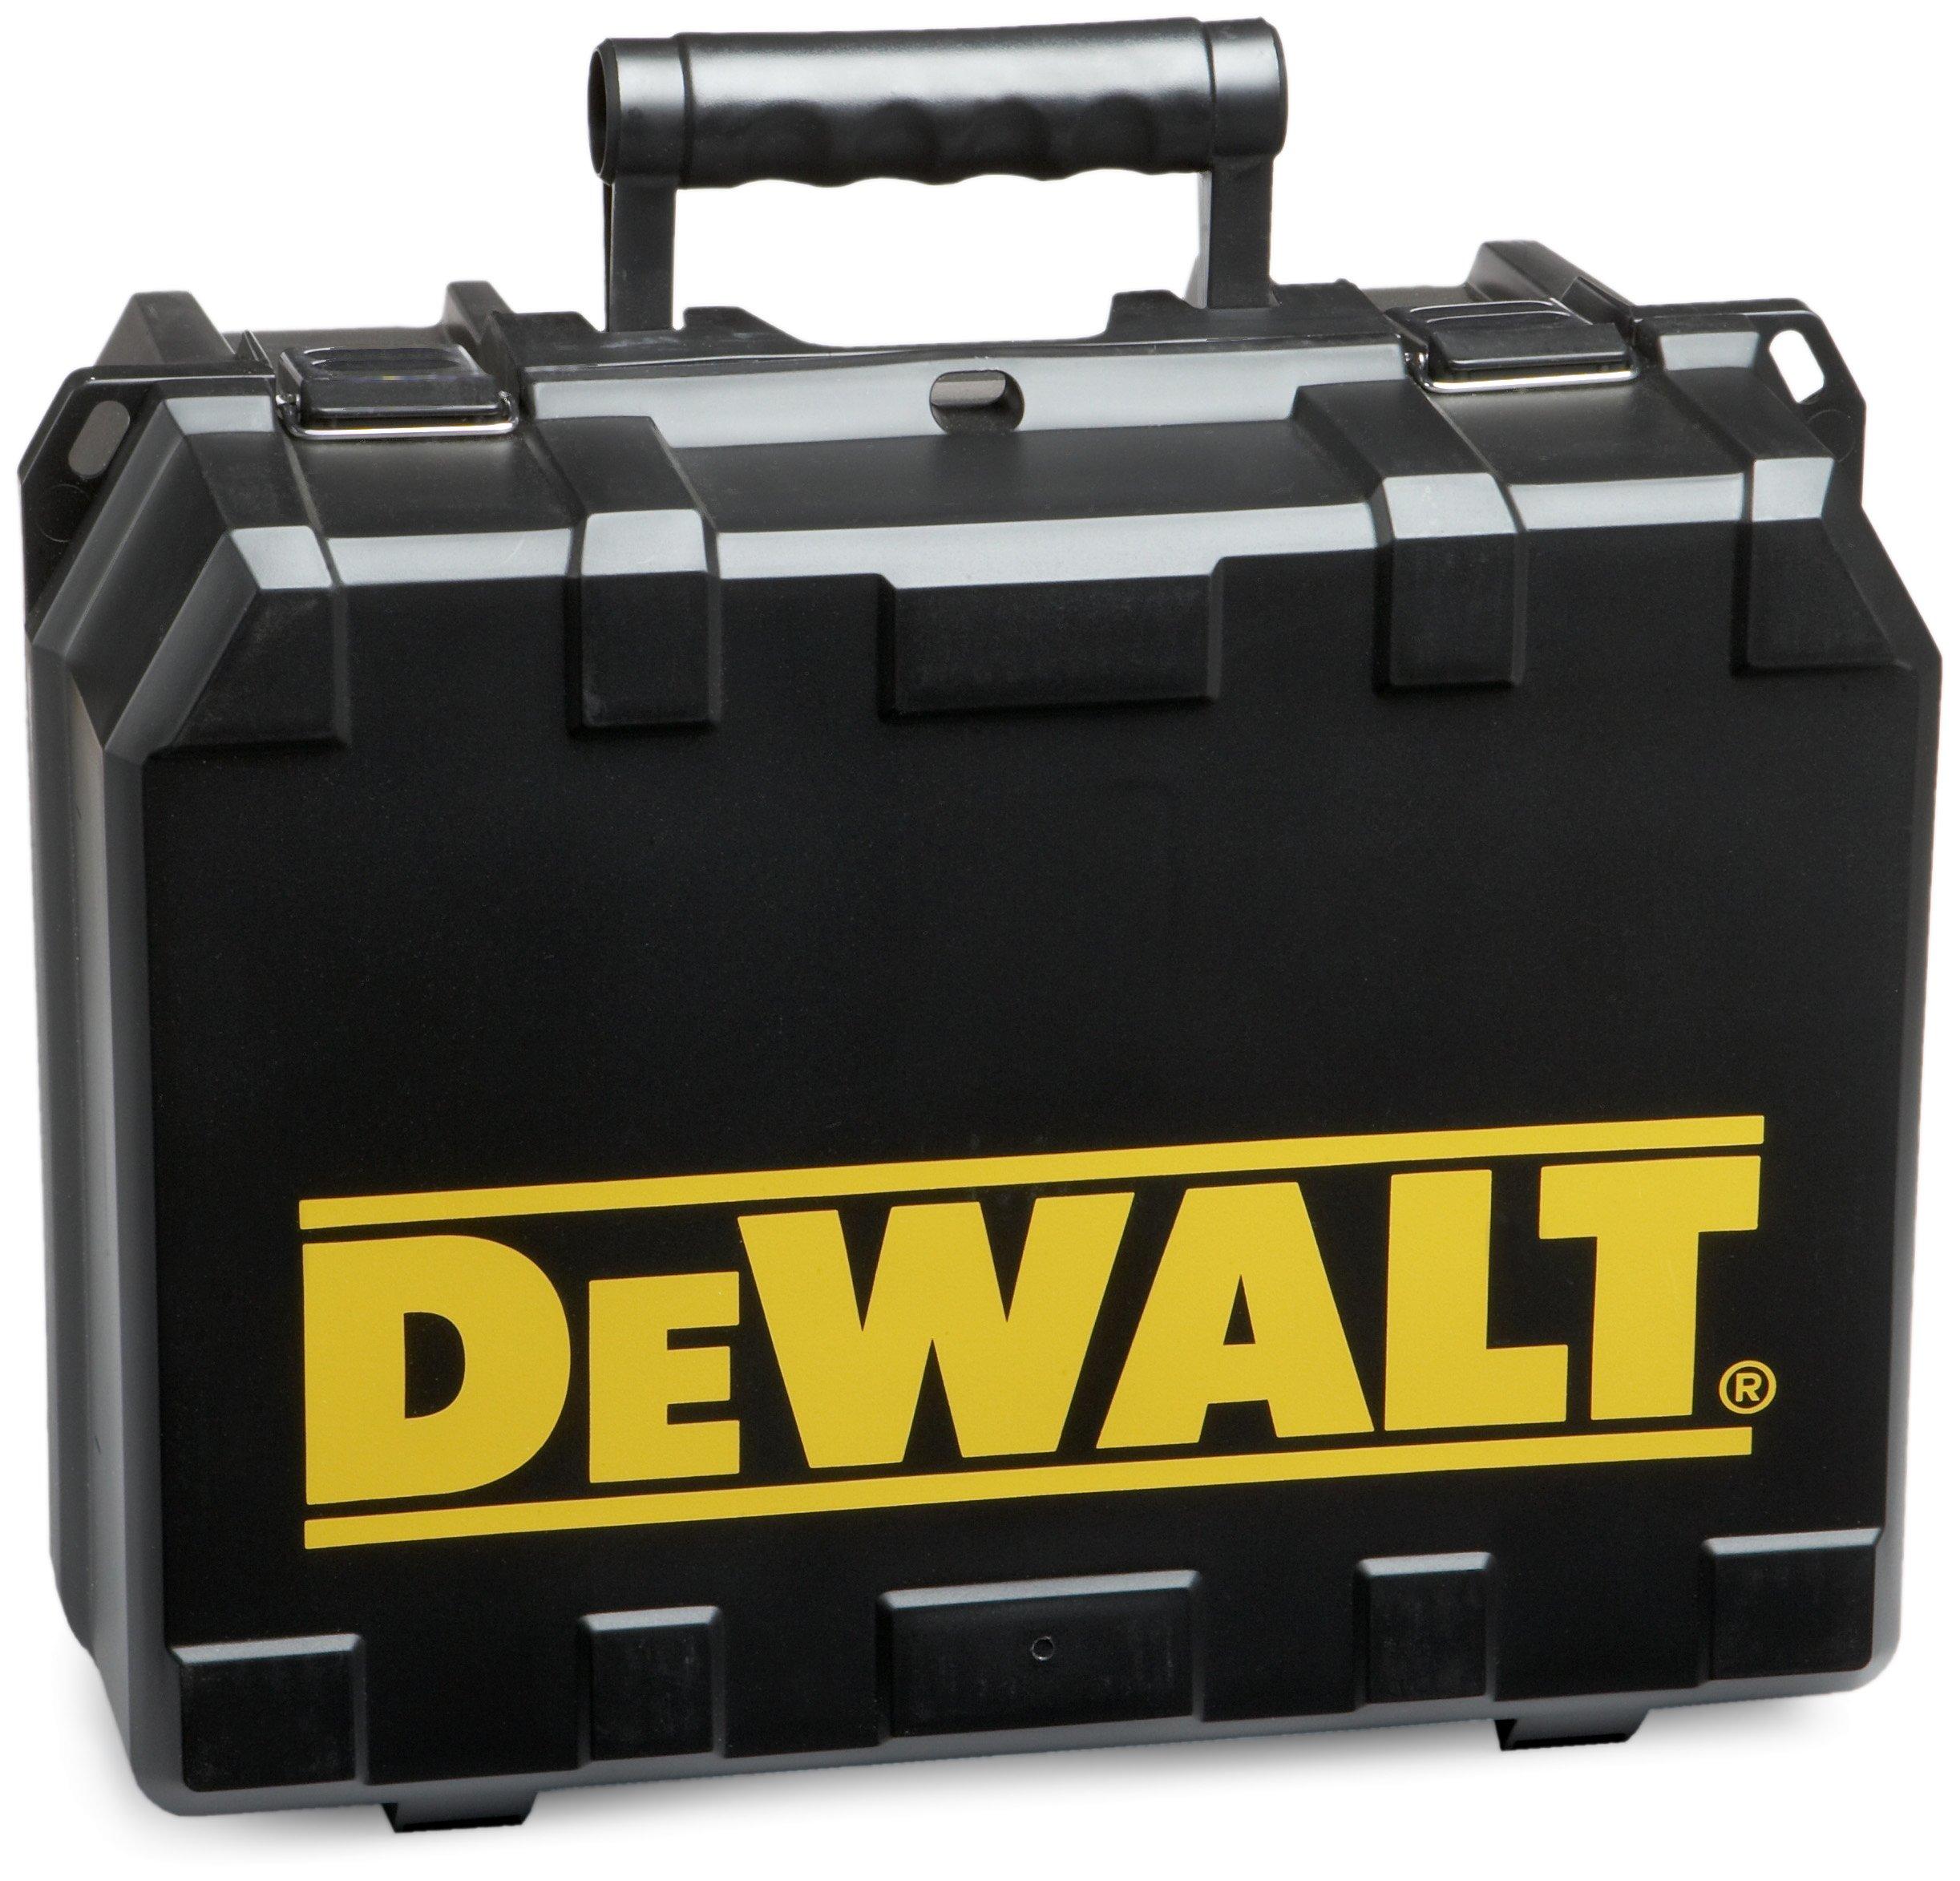 DEWALT DW680K 7 Amp 3-1/4-Inch Planer